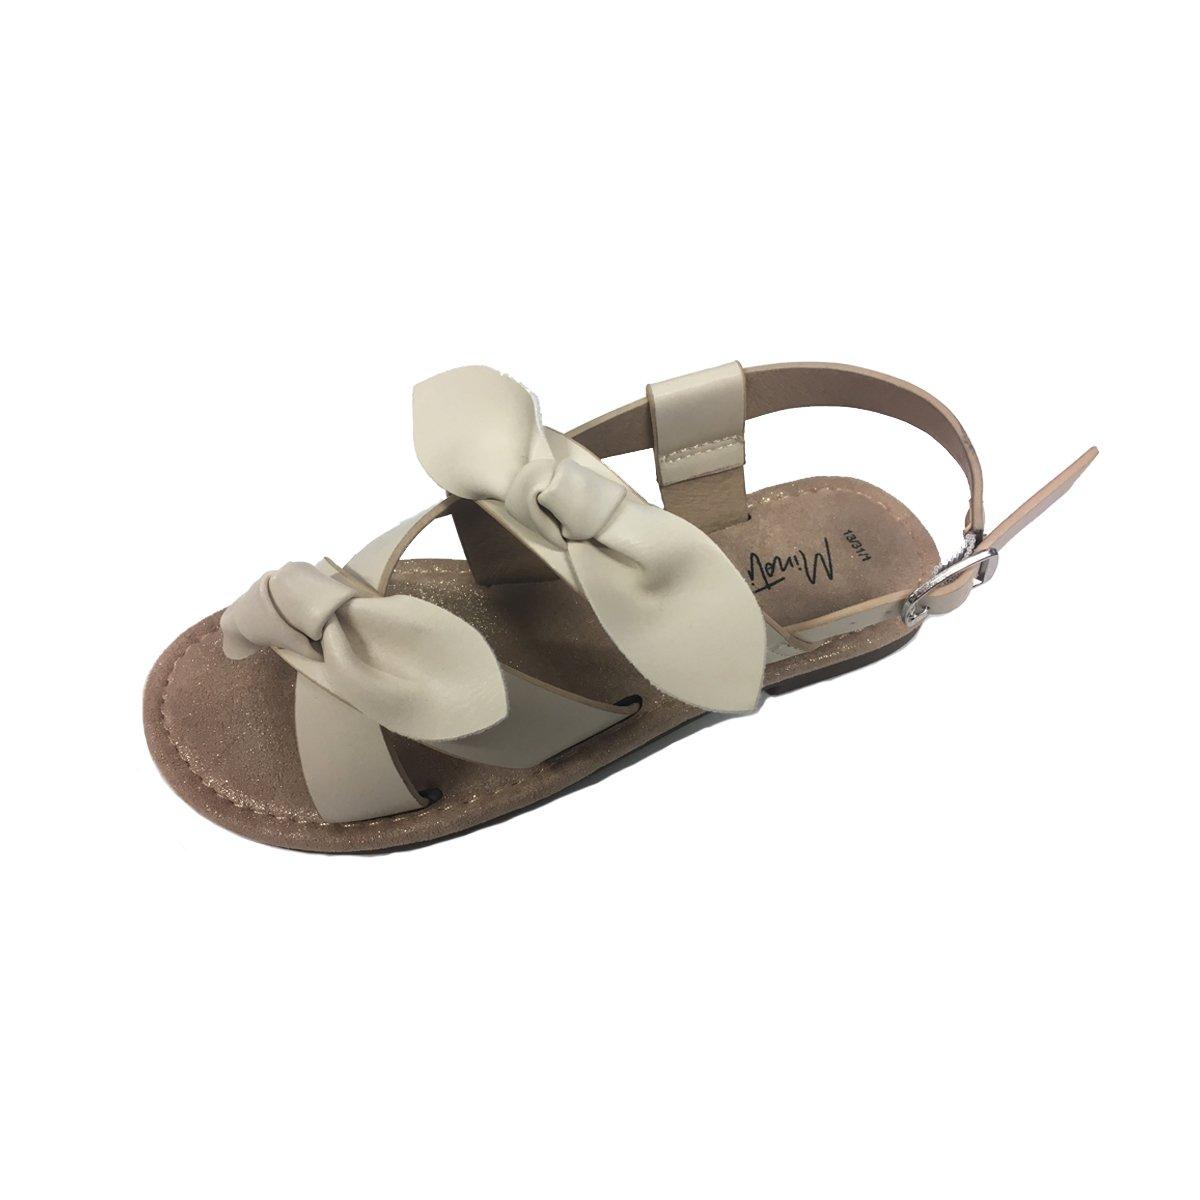 Sandale in curele si cu funde aplicate, Minoti Shoe